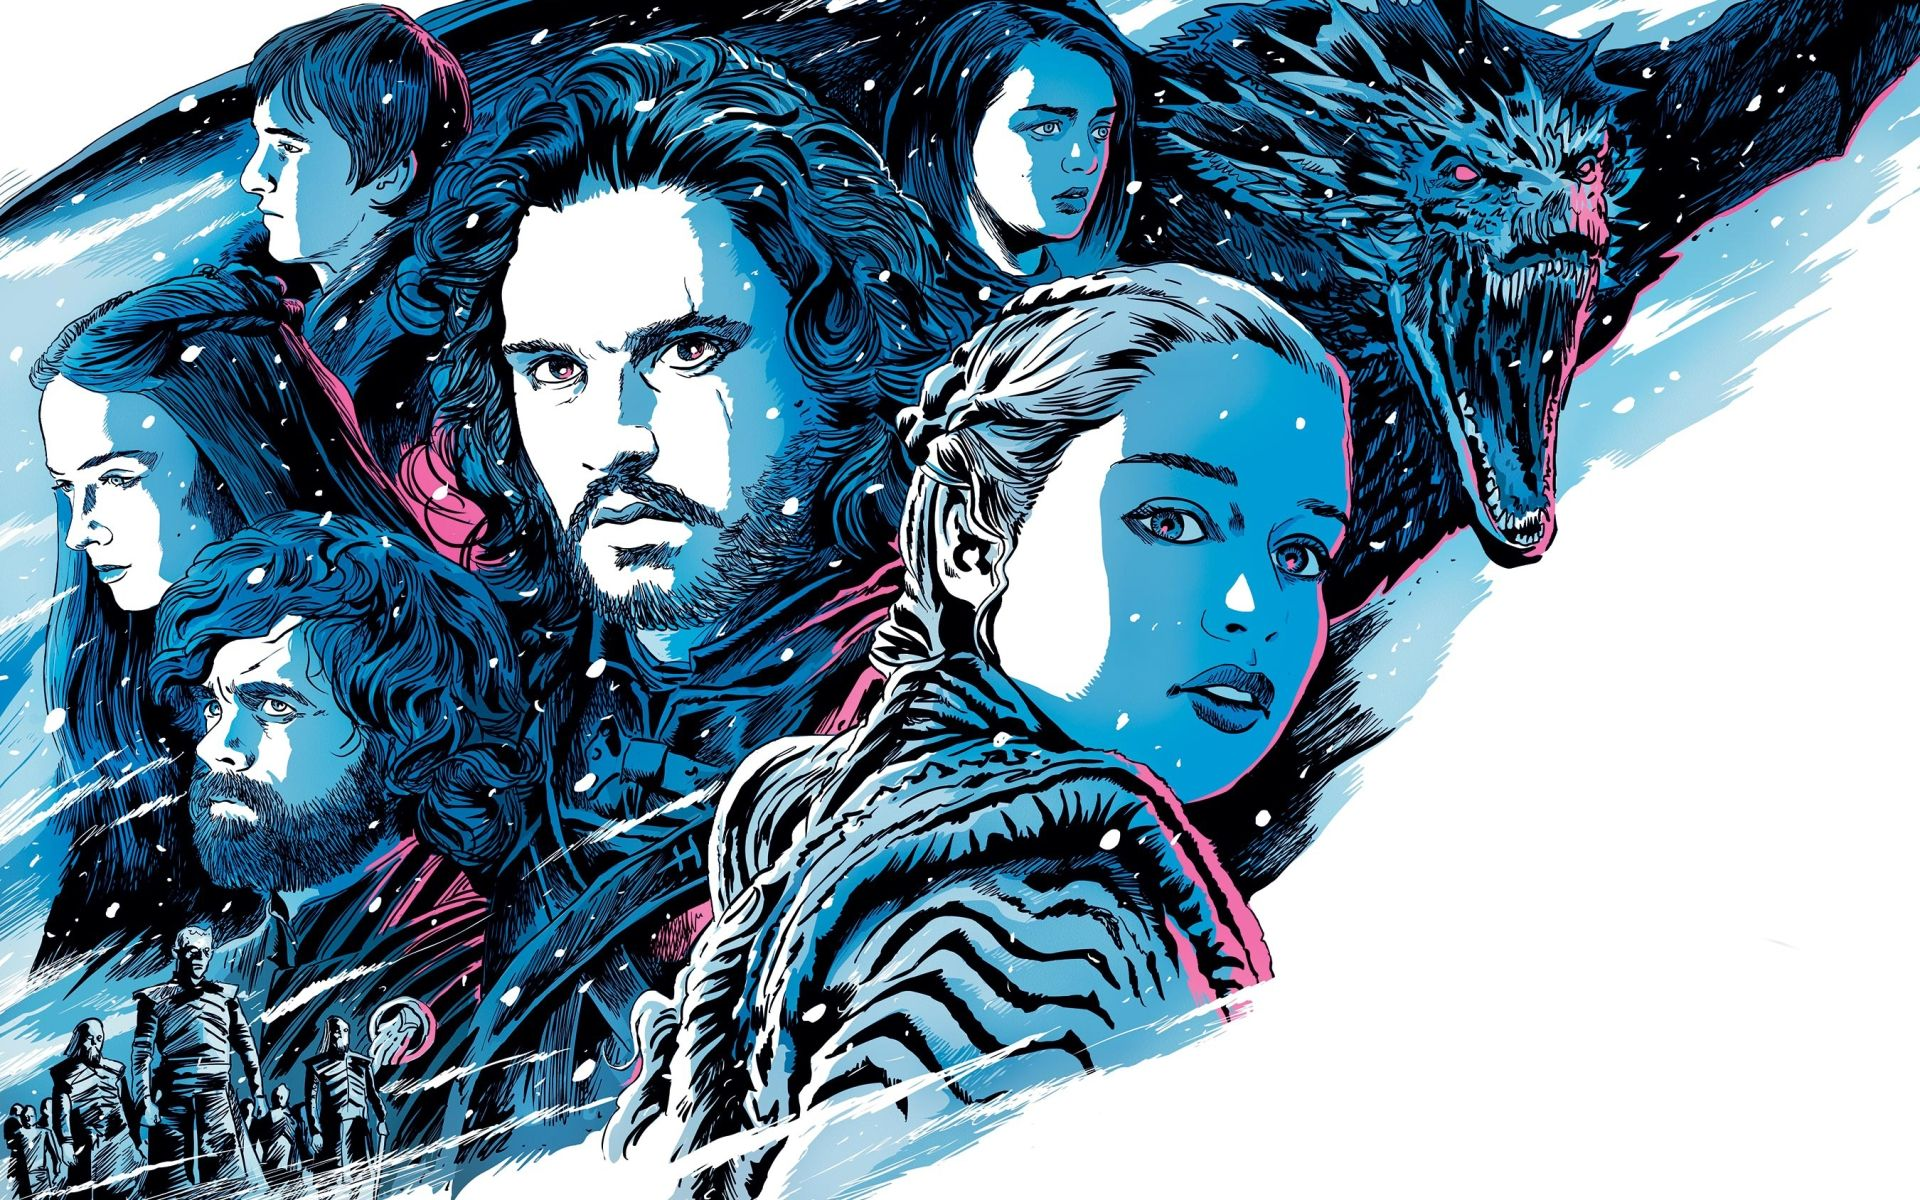 Game of Thrones Daenerys and Jon Snow fanart